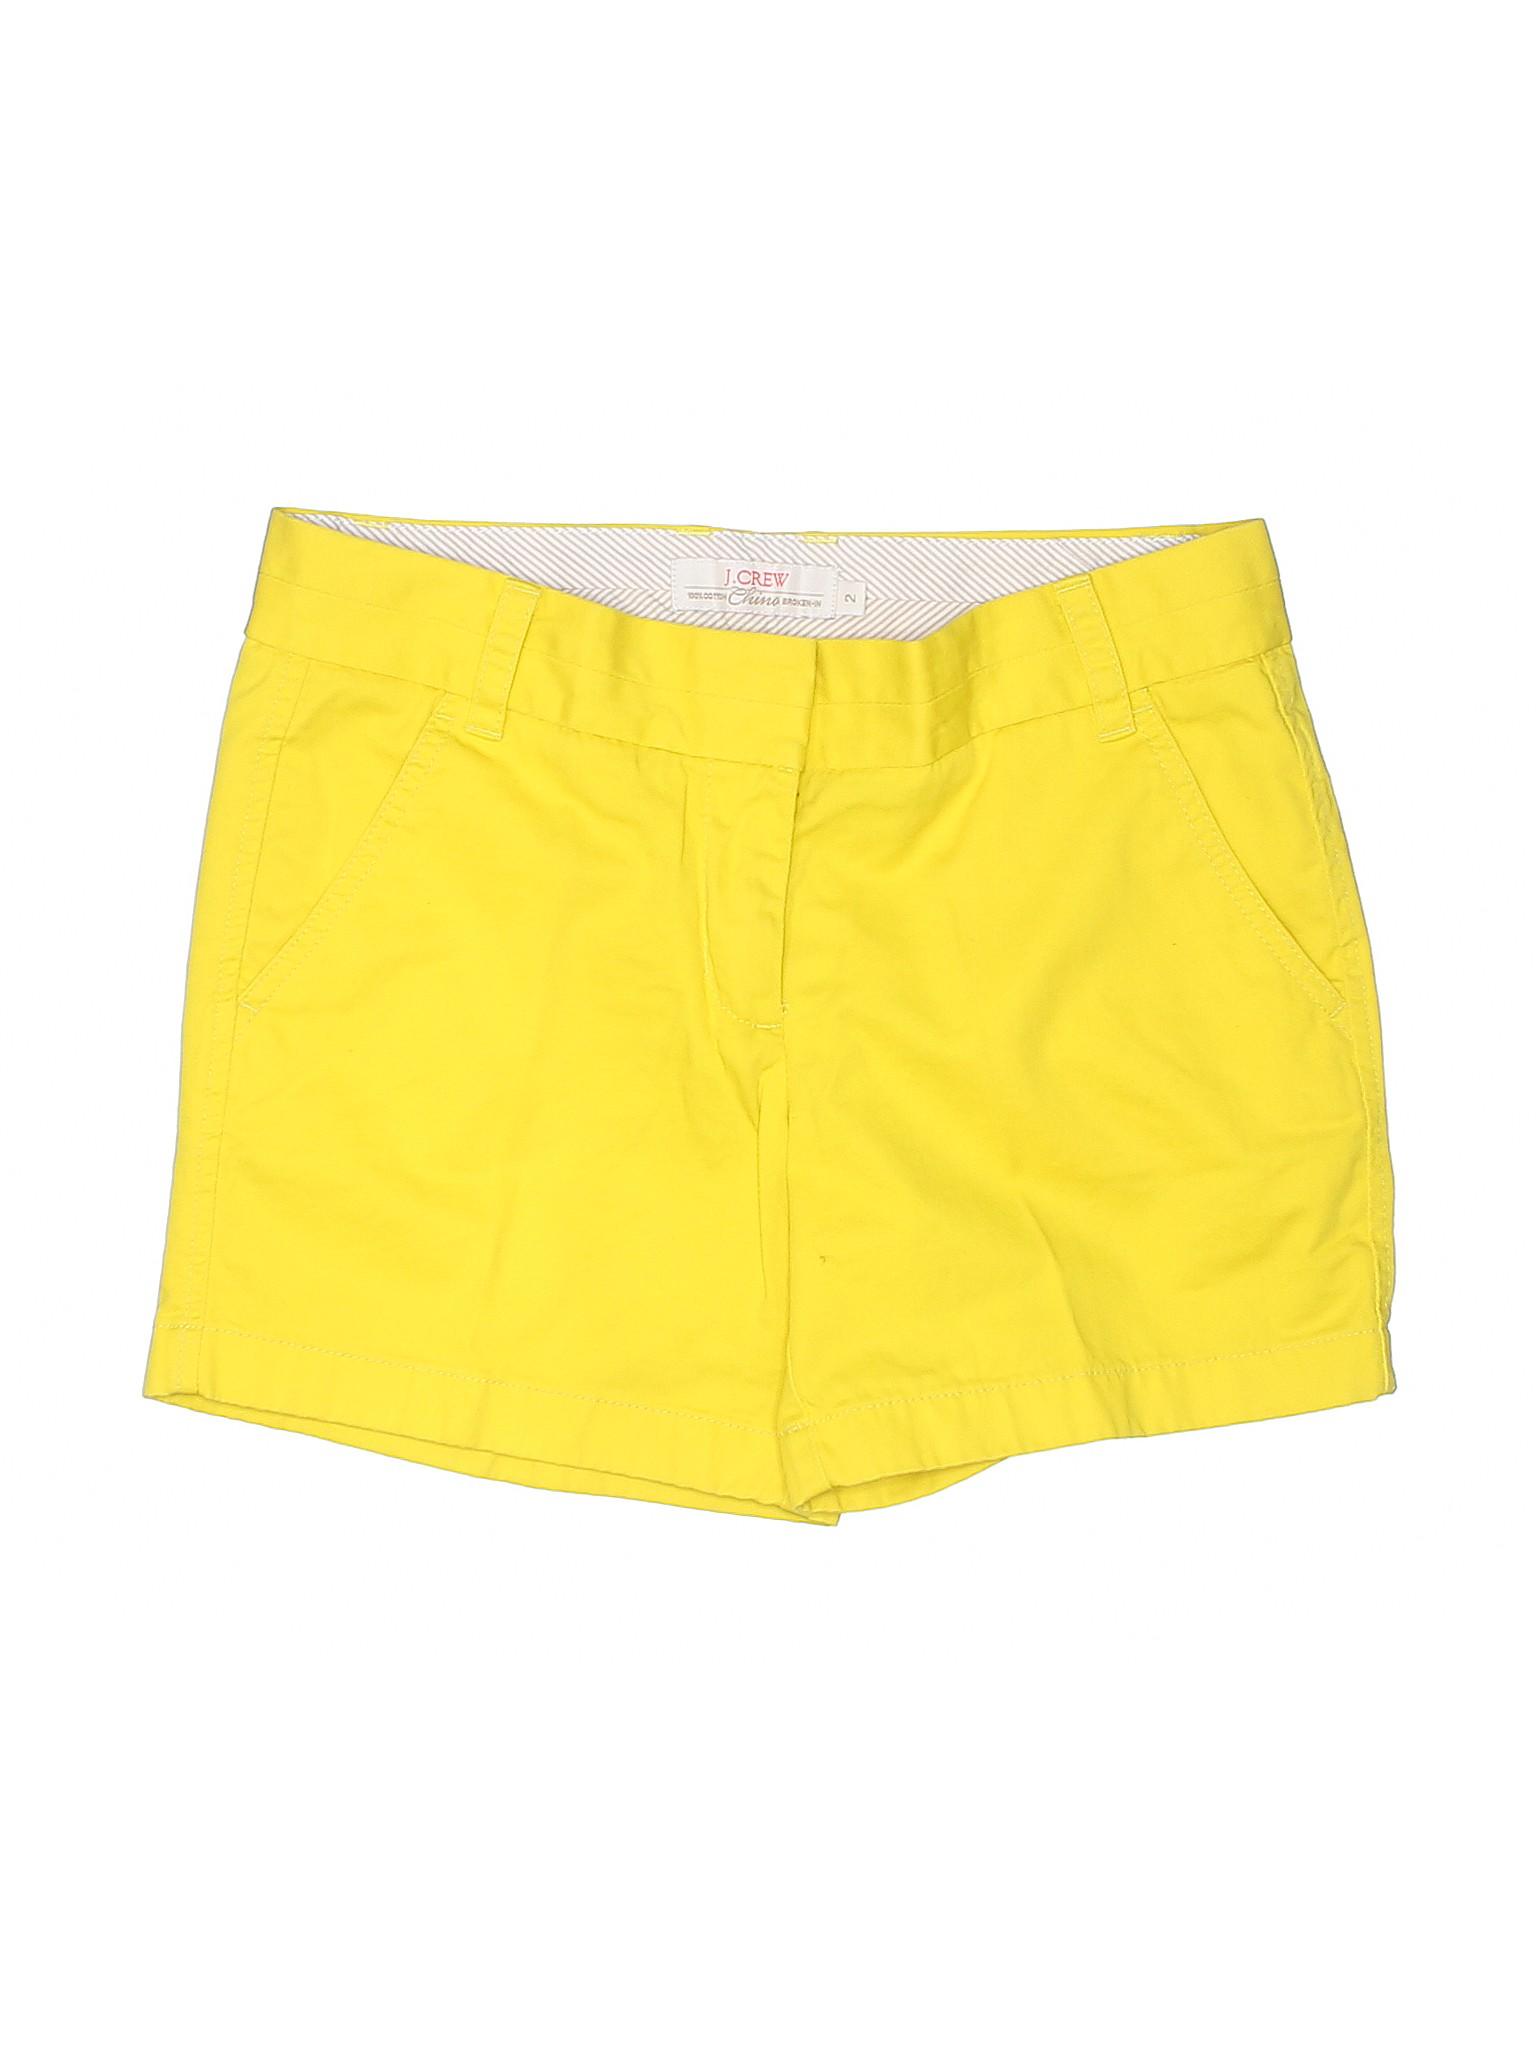 J Shorts J Crew Crew Khaki Crew Boutique Boutique Khaki J Boutique Khaki Shorts Shorts xYq6pCfv